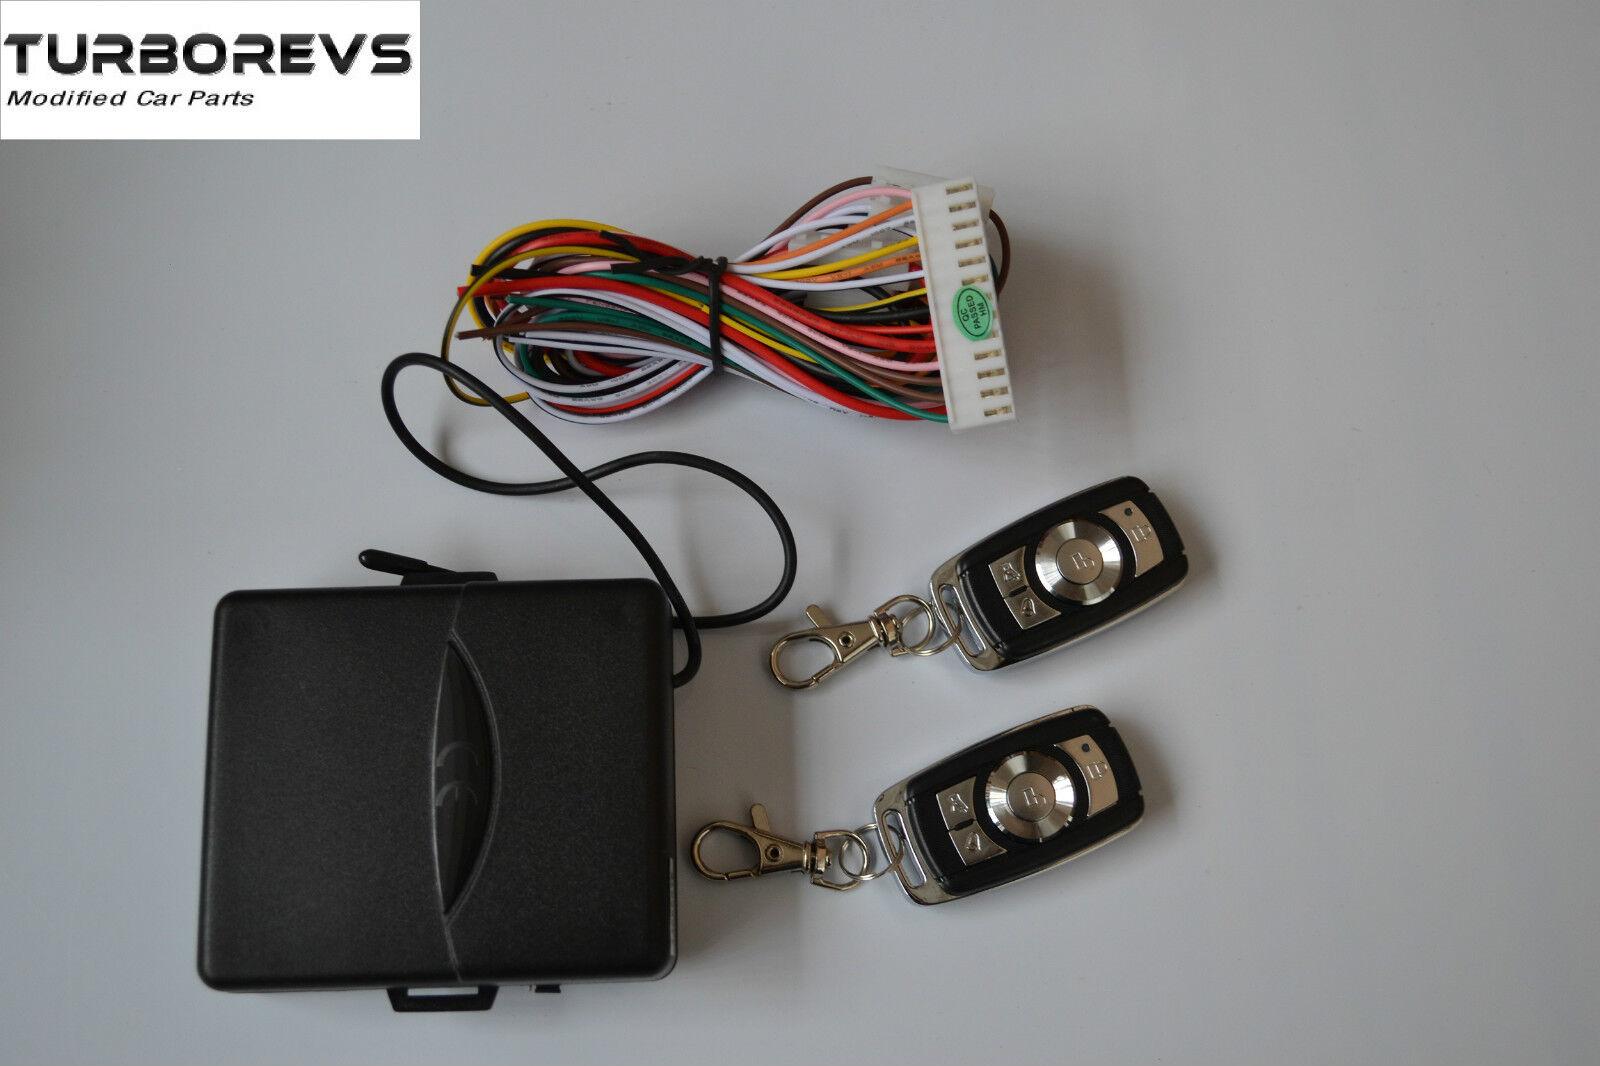 Remote Keyless Entry Central Locking Mitsubishi Shogun Ebay Wiring Diagram